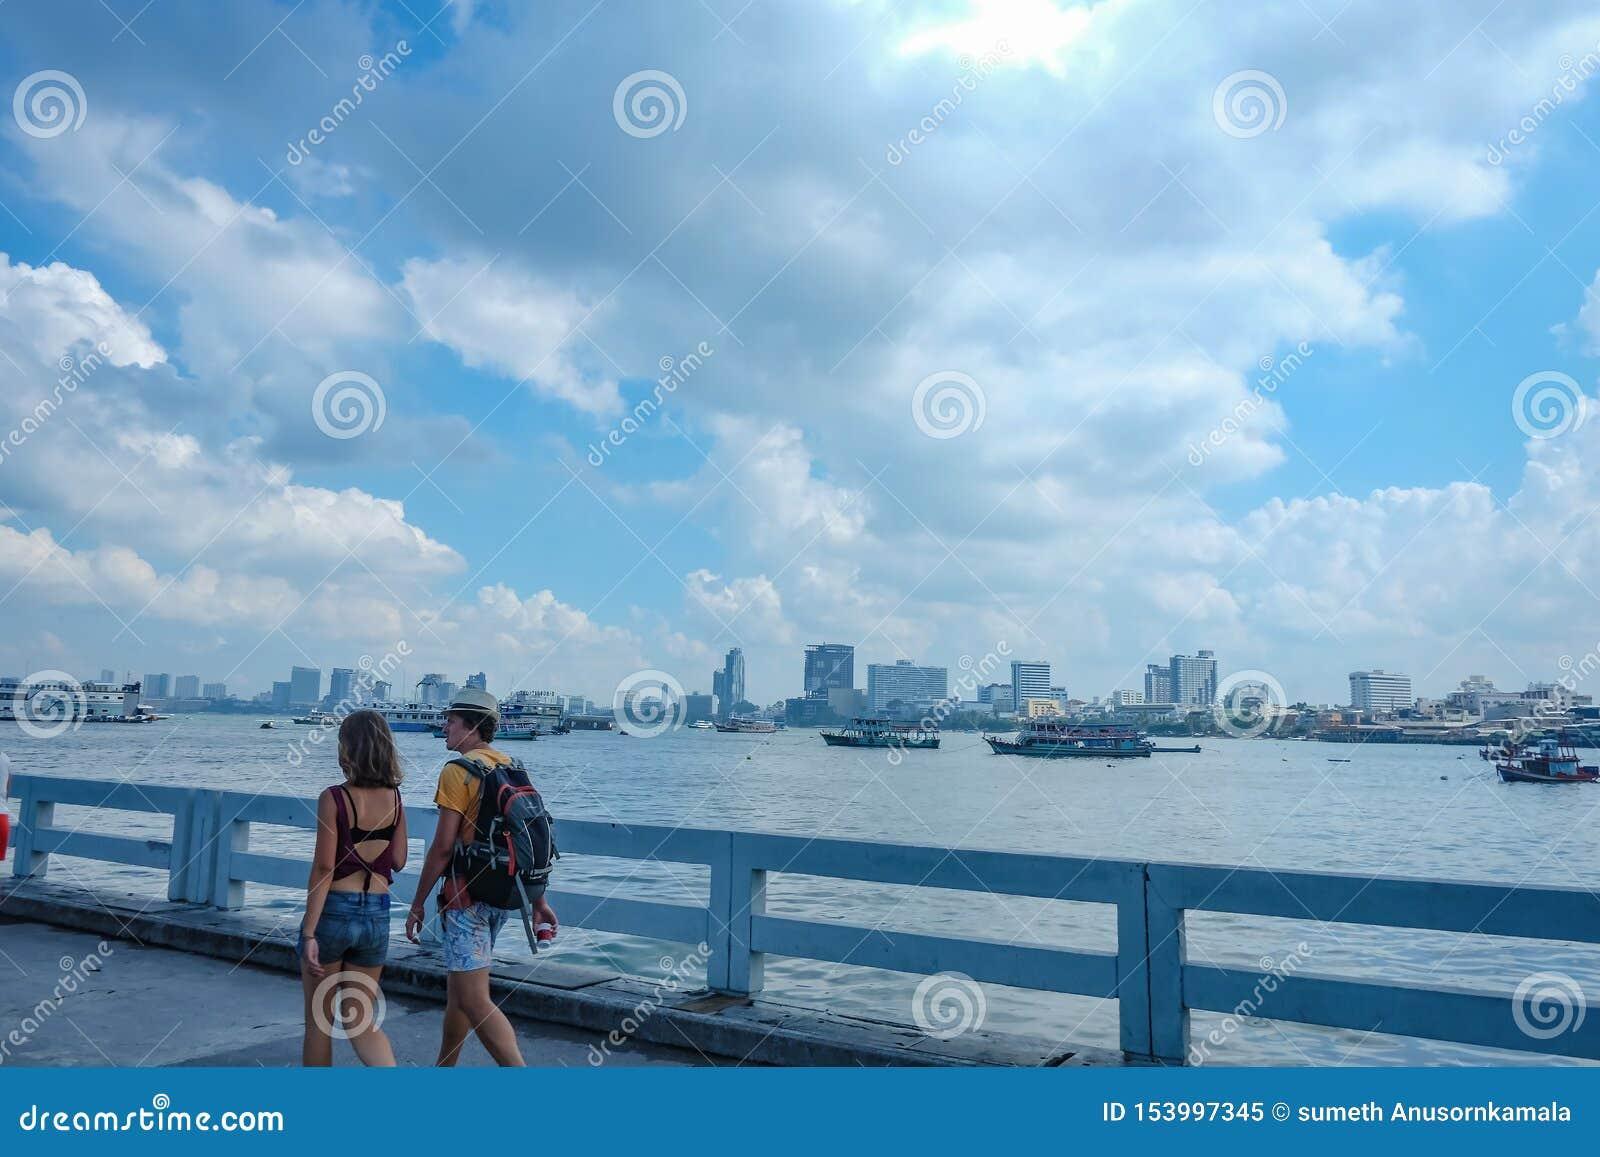 Where Is Bali Hai Island unacquainted chinese people and tourist walking on bali hai